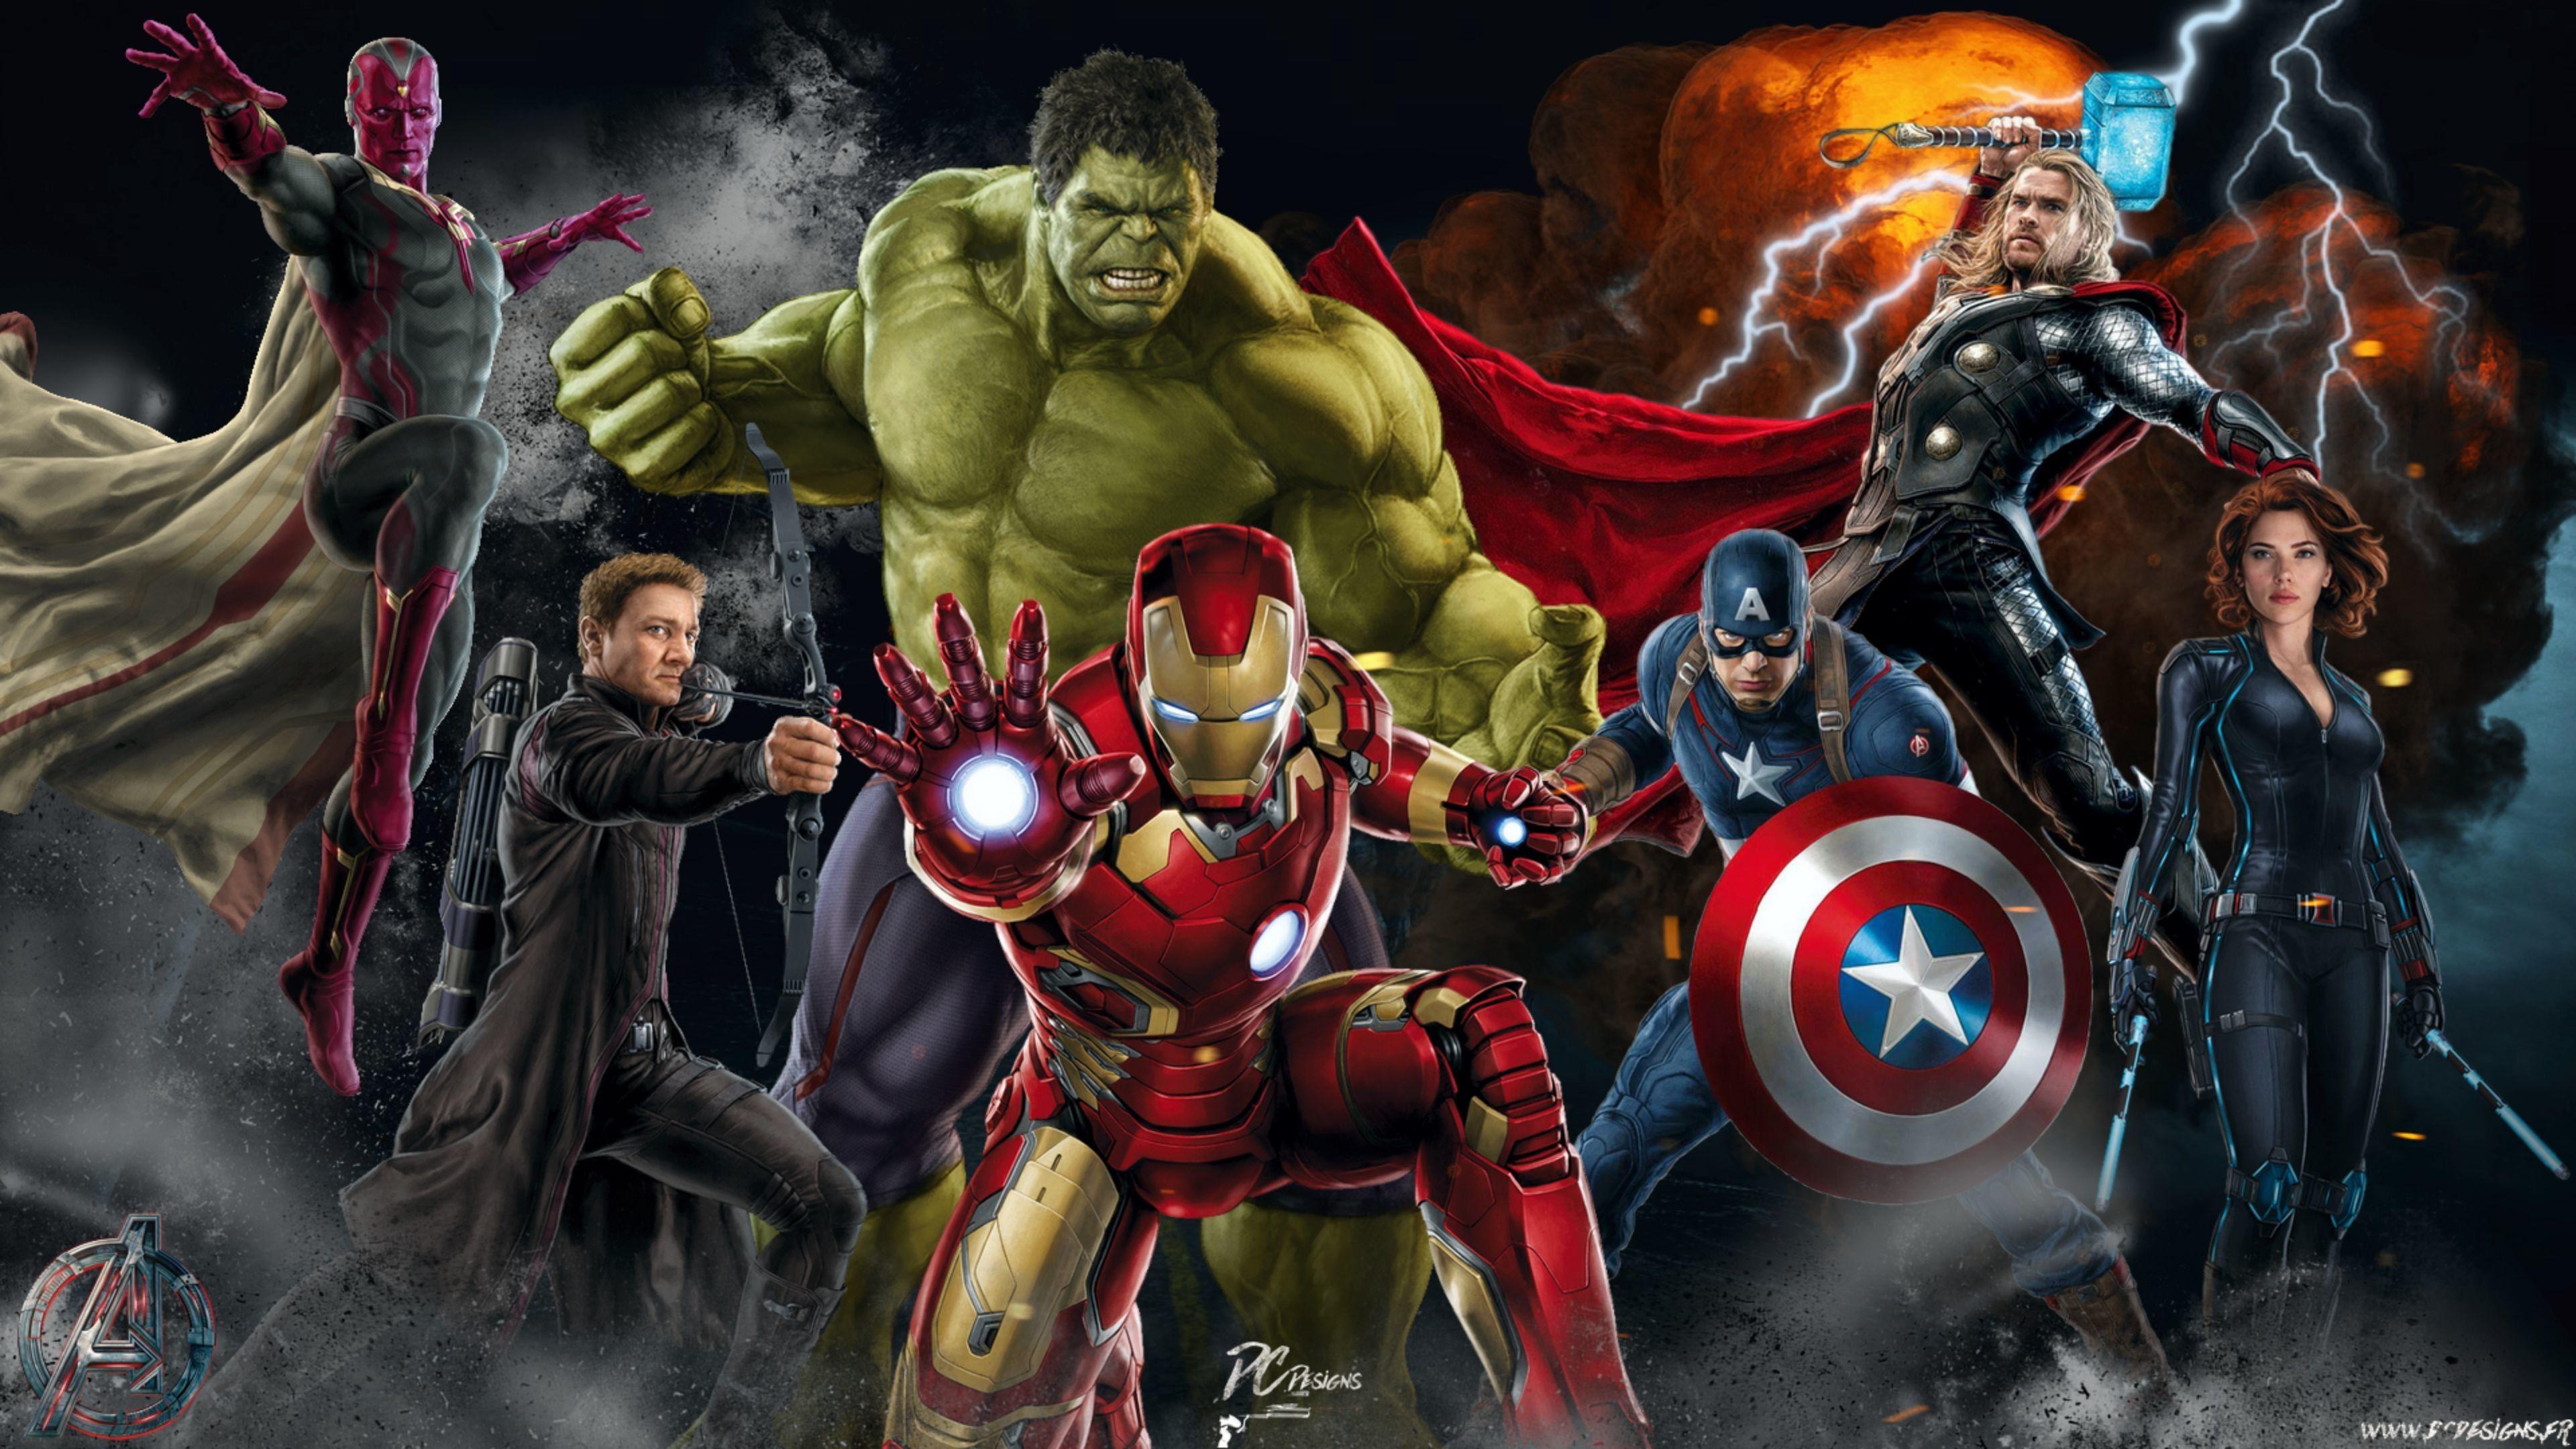 3840x2160 Download Original Resolution Avengers Wallpaper Iron Man Wallpaper Captain America Wallpaper